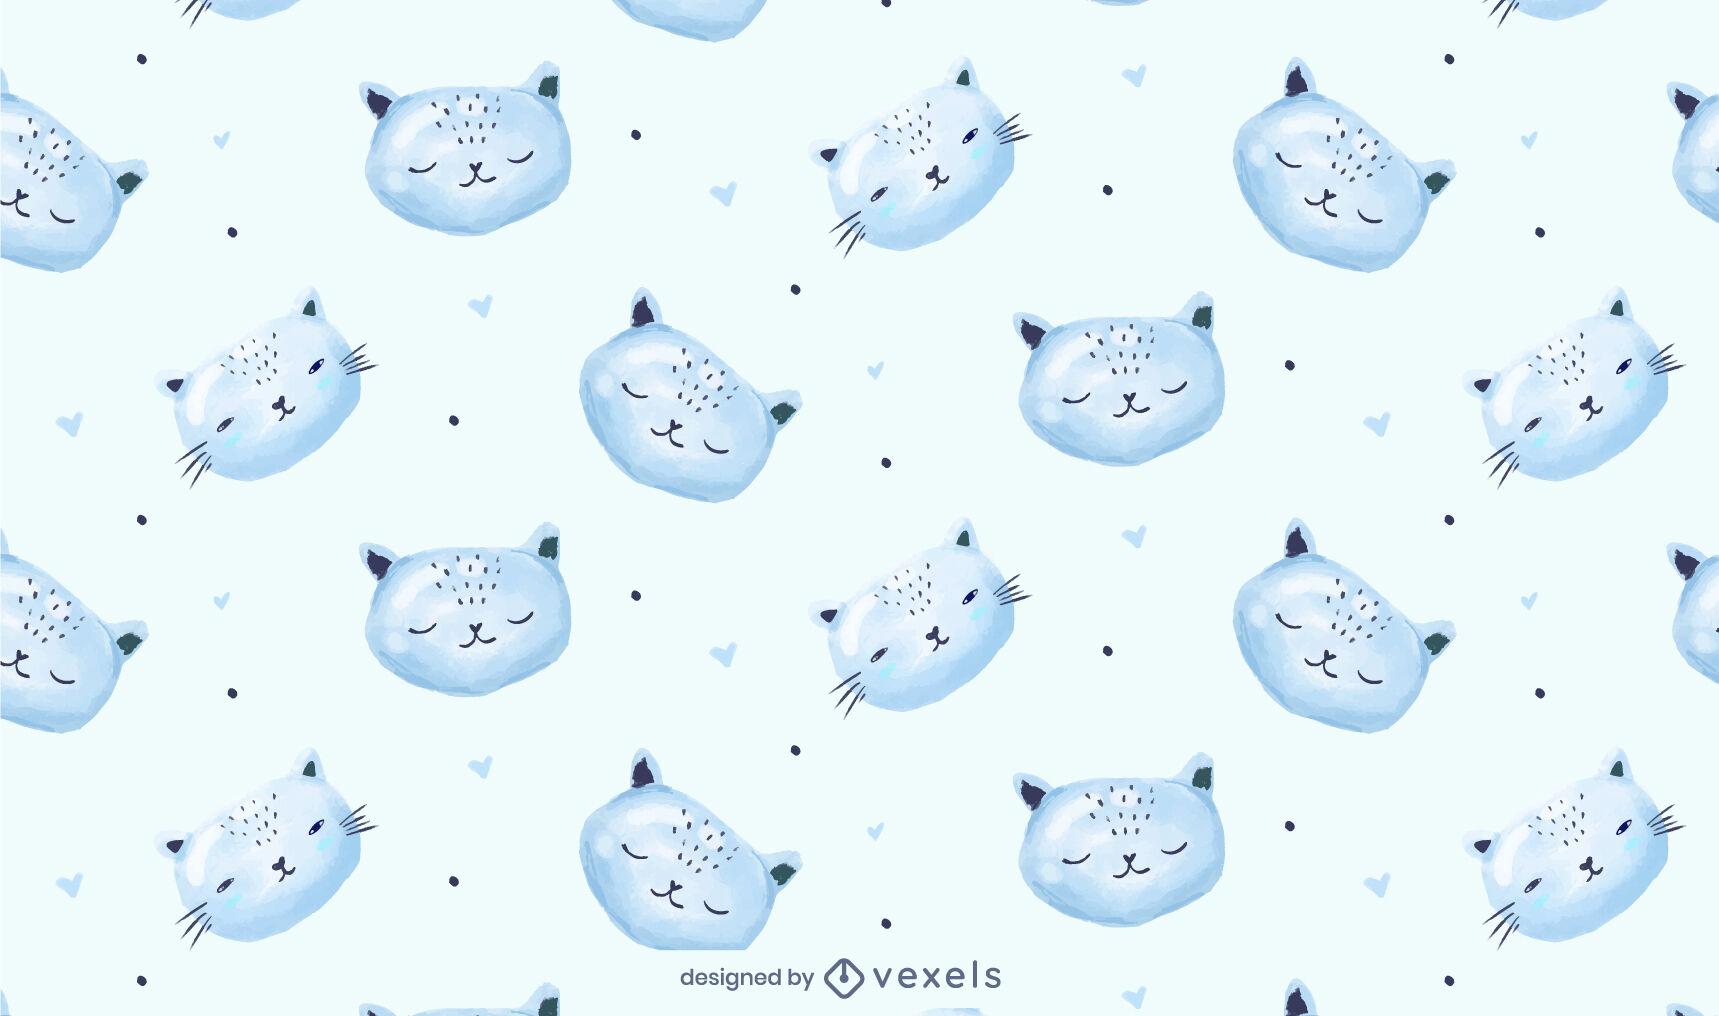 Sleeping kitty cat animal pattern design